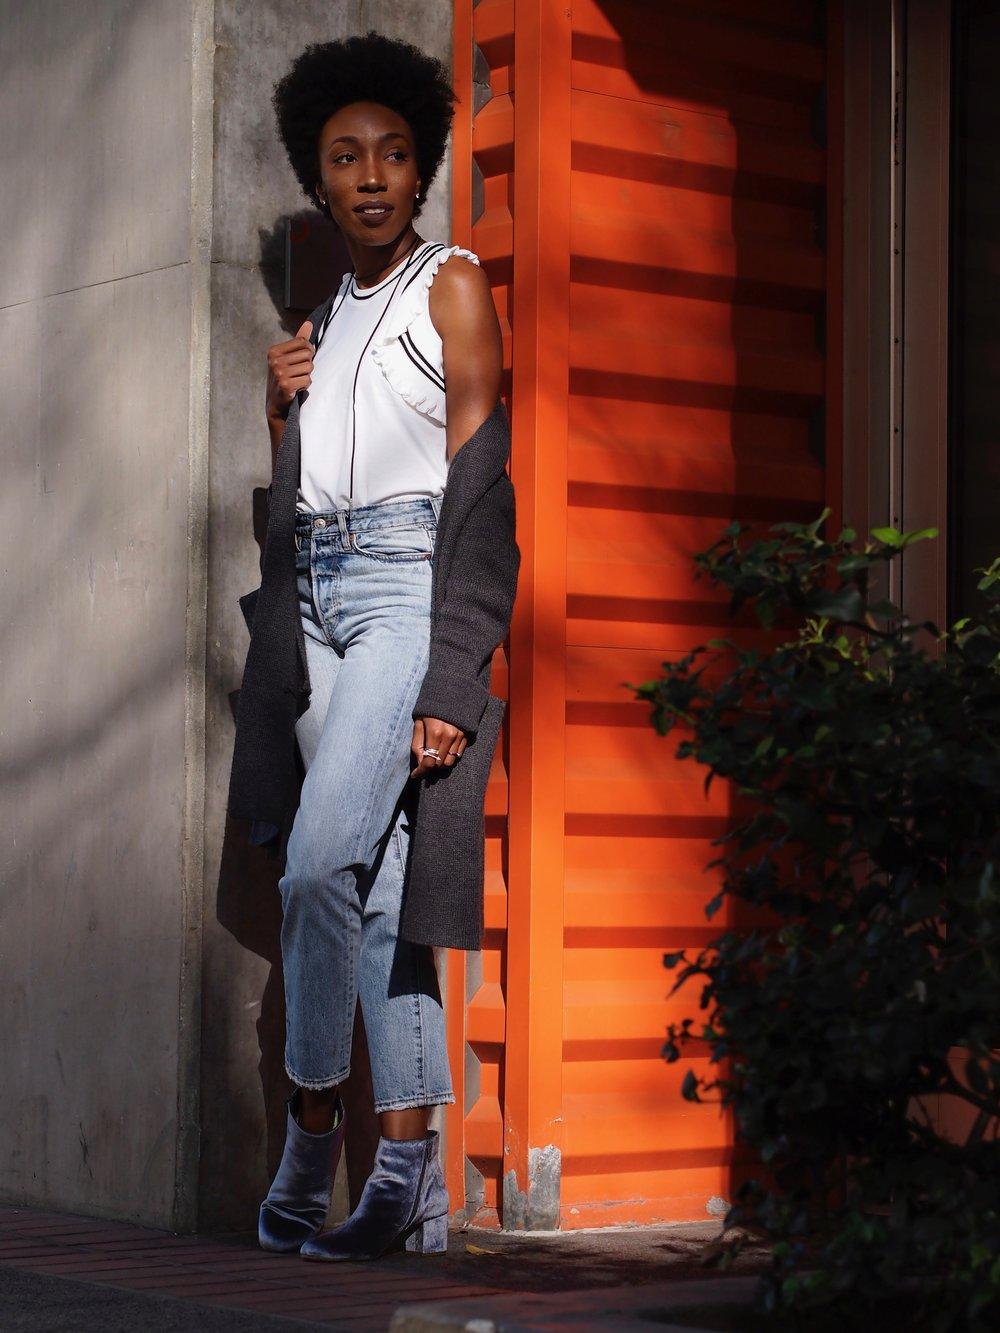 Straight leg crop  Jeans:  H&M   Top:  Cabi   Boots: Target  Cardigan: H&M  Chocker:  A'GACI